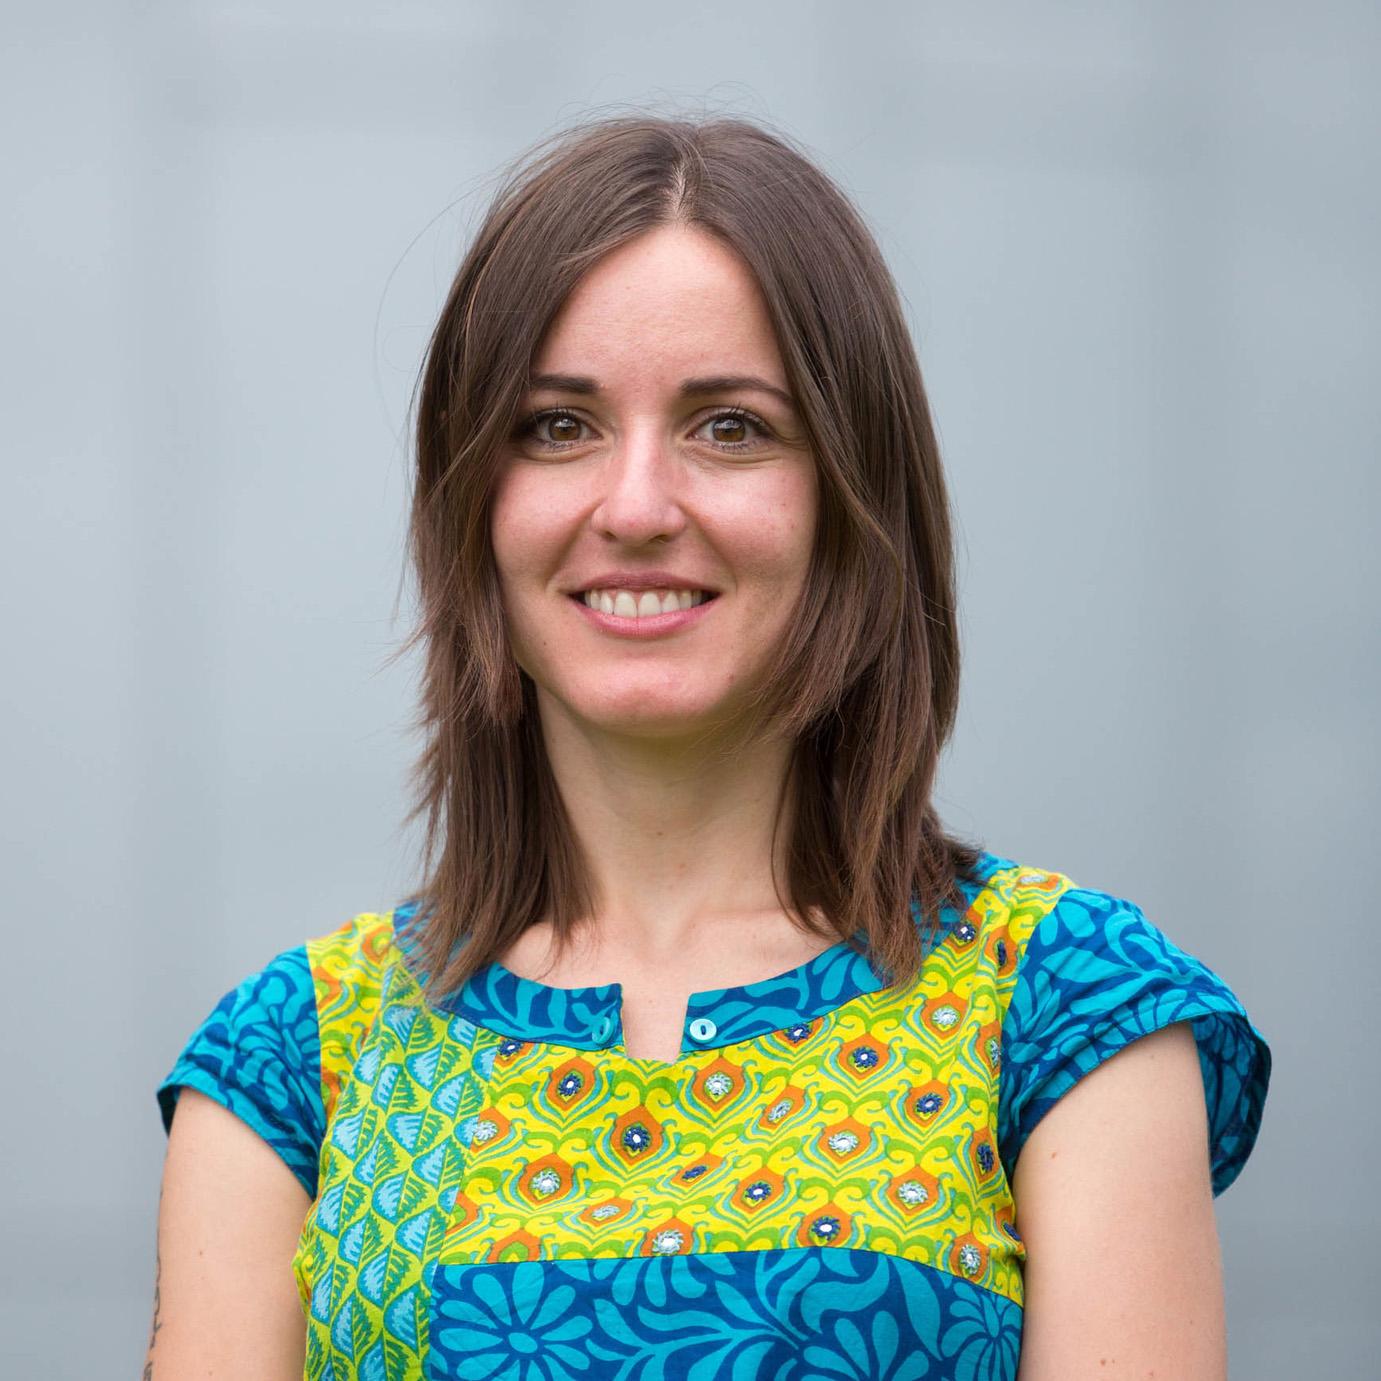 Liliana Pasquale